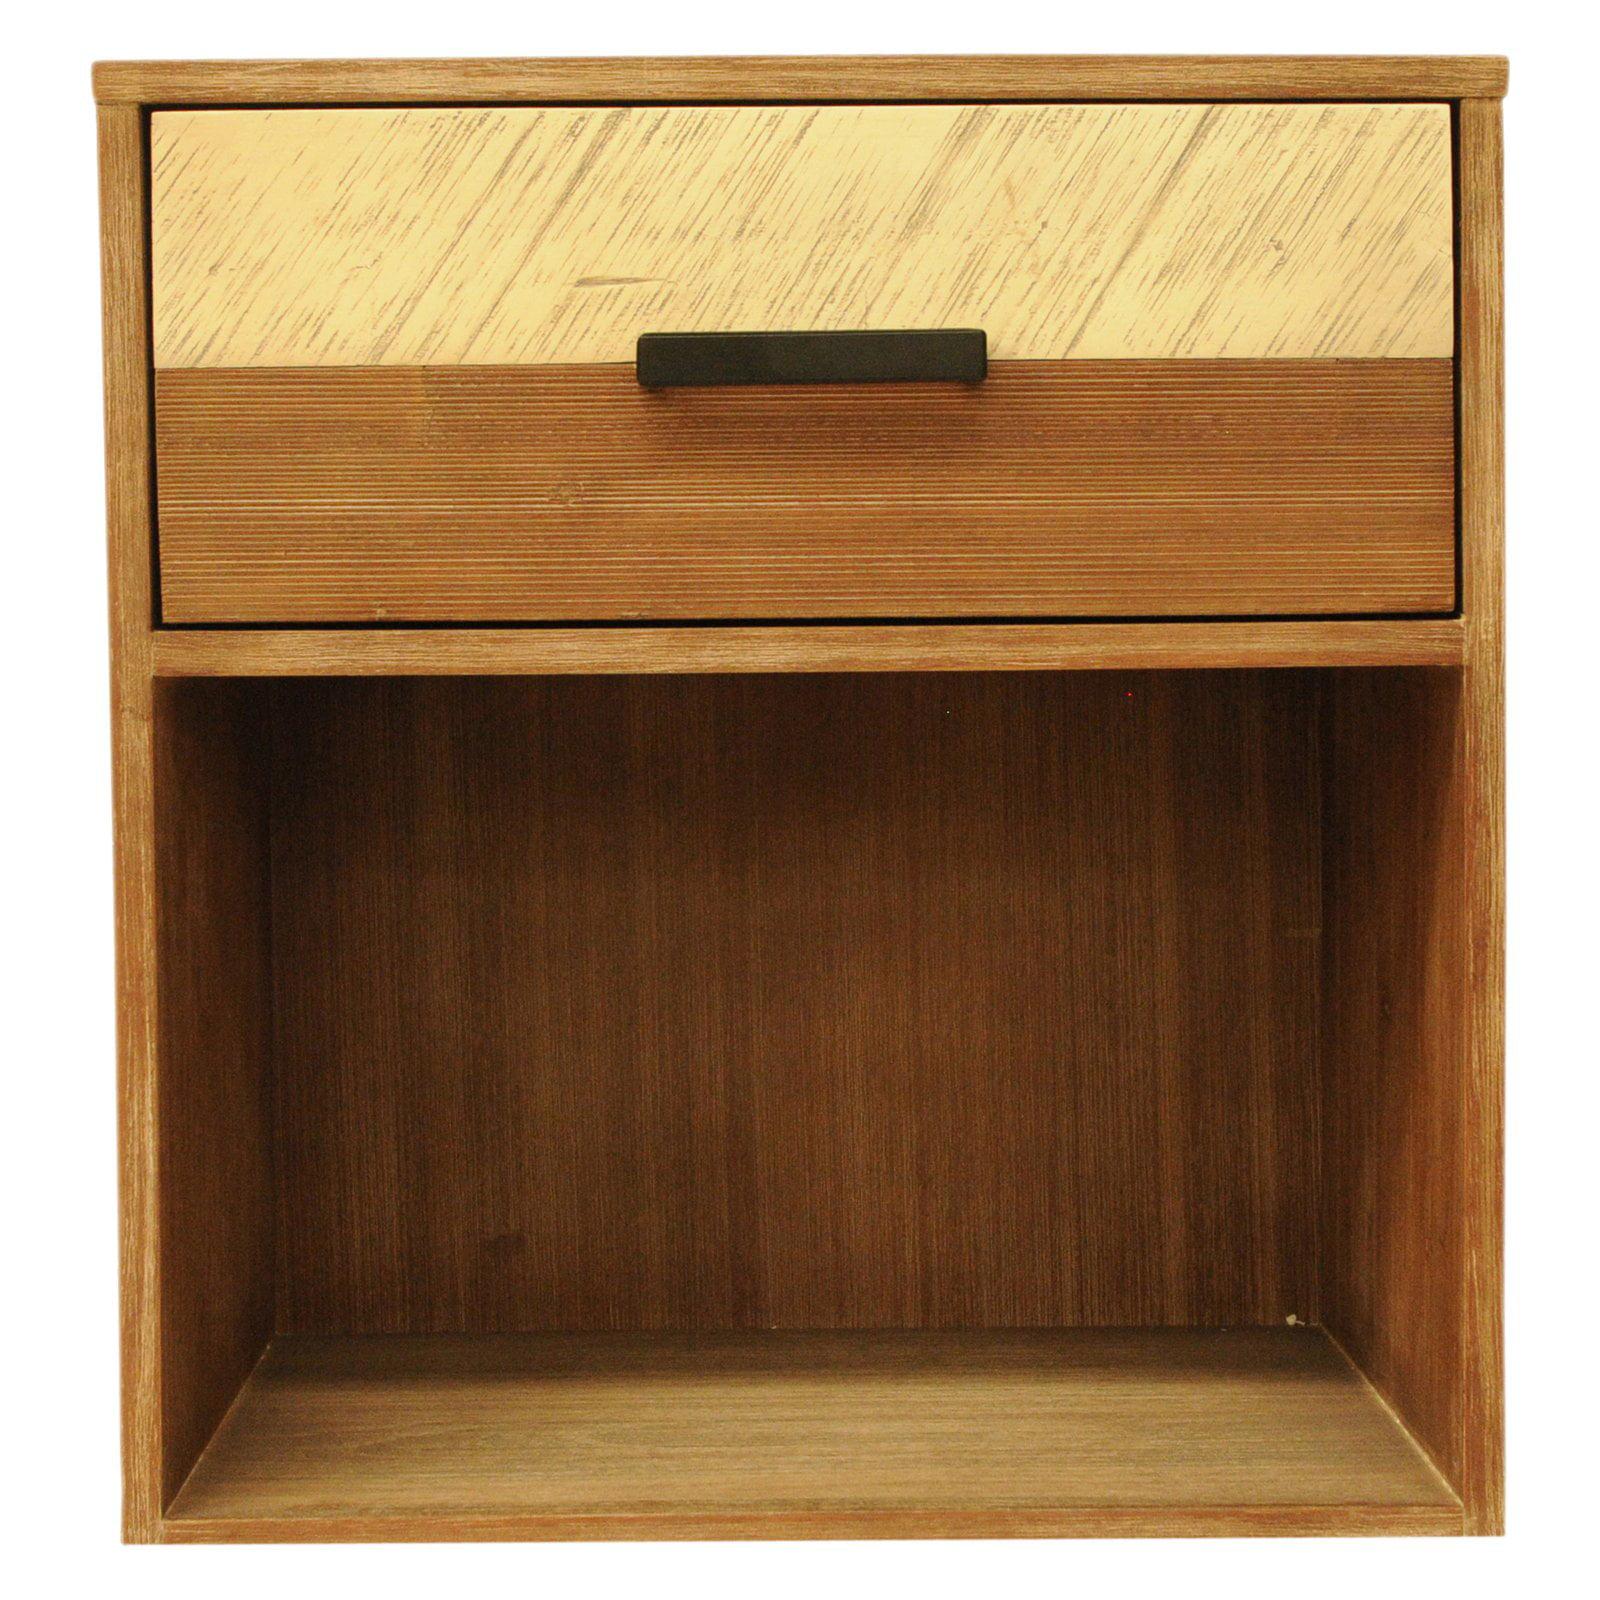 CDI International Furniture 1 Drawer Medley Nightstand